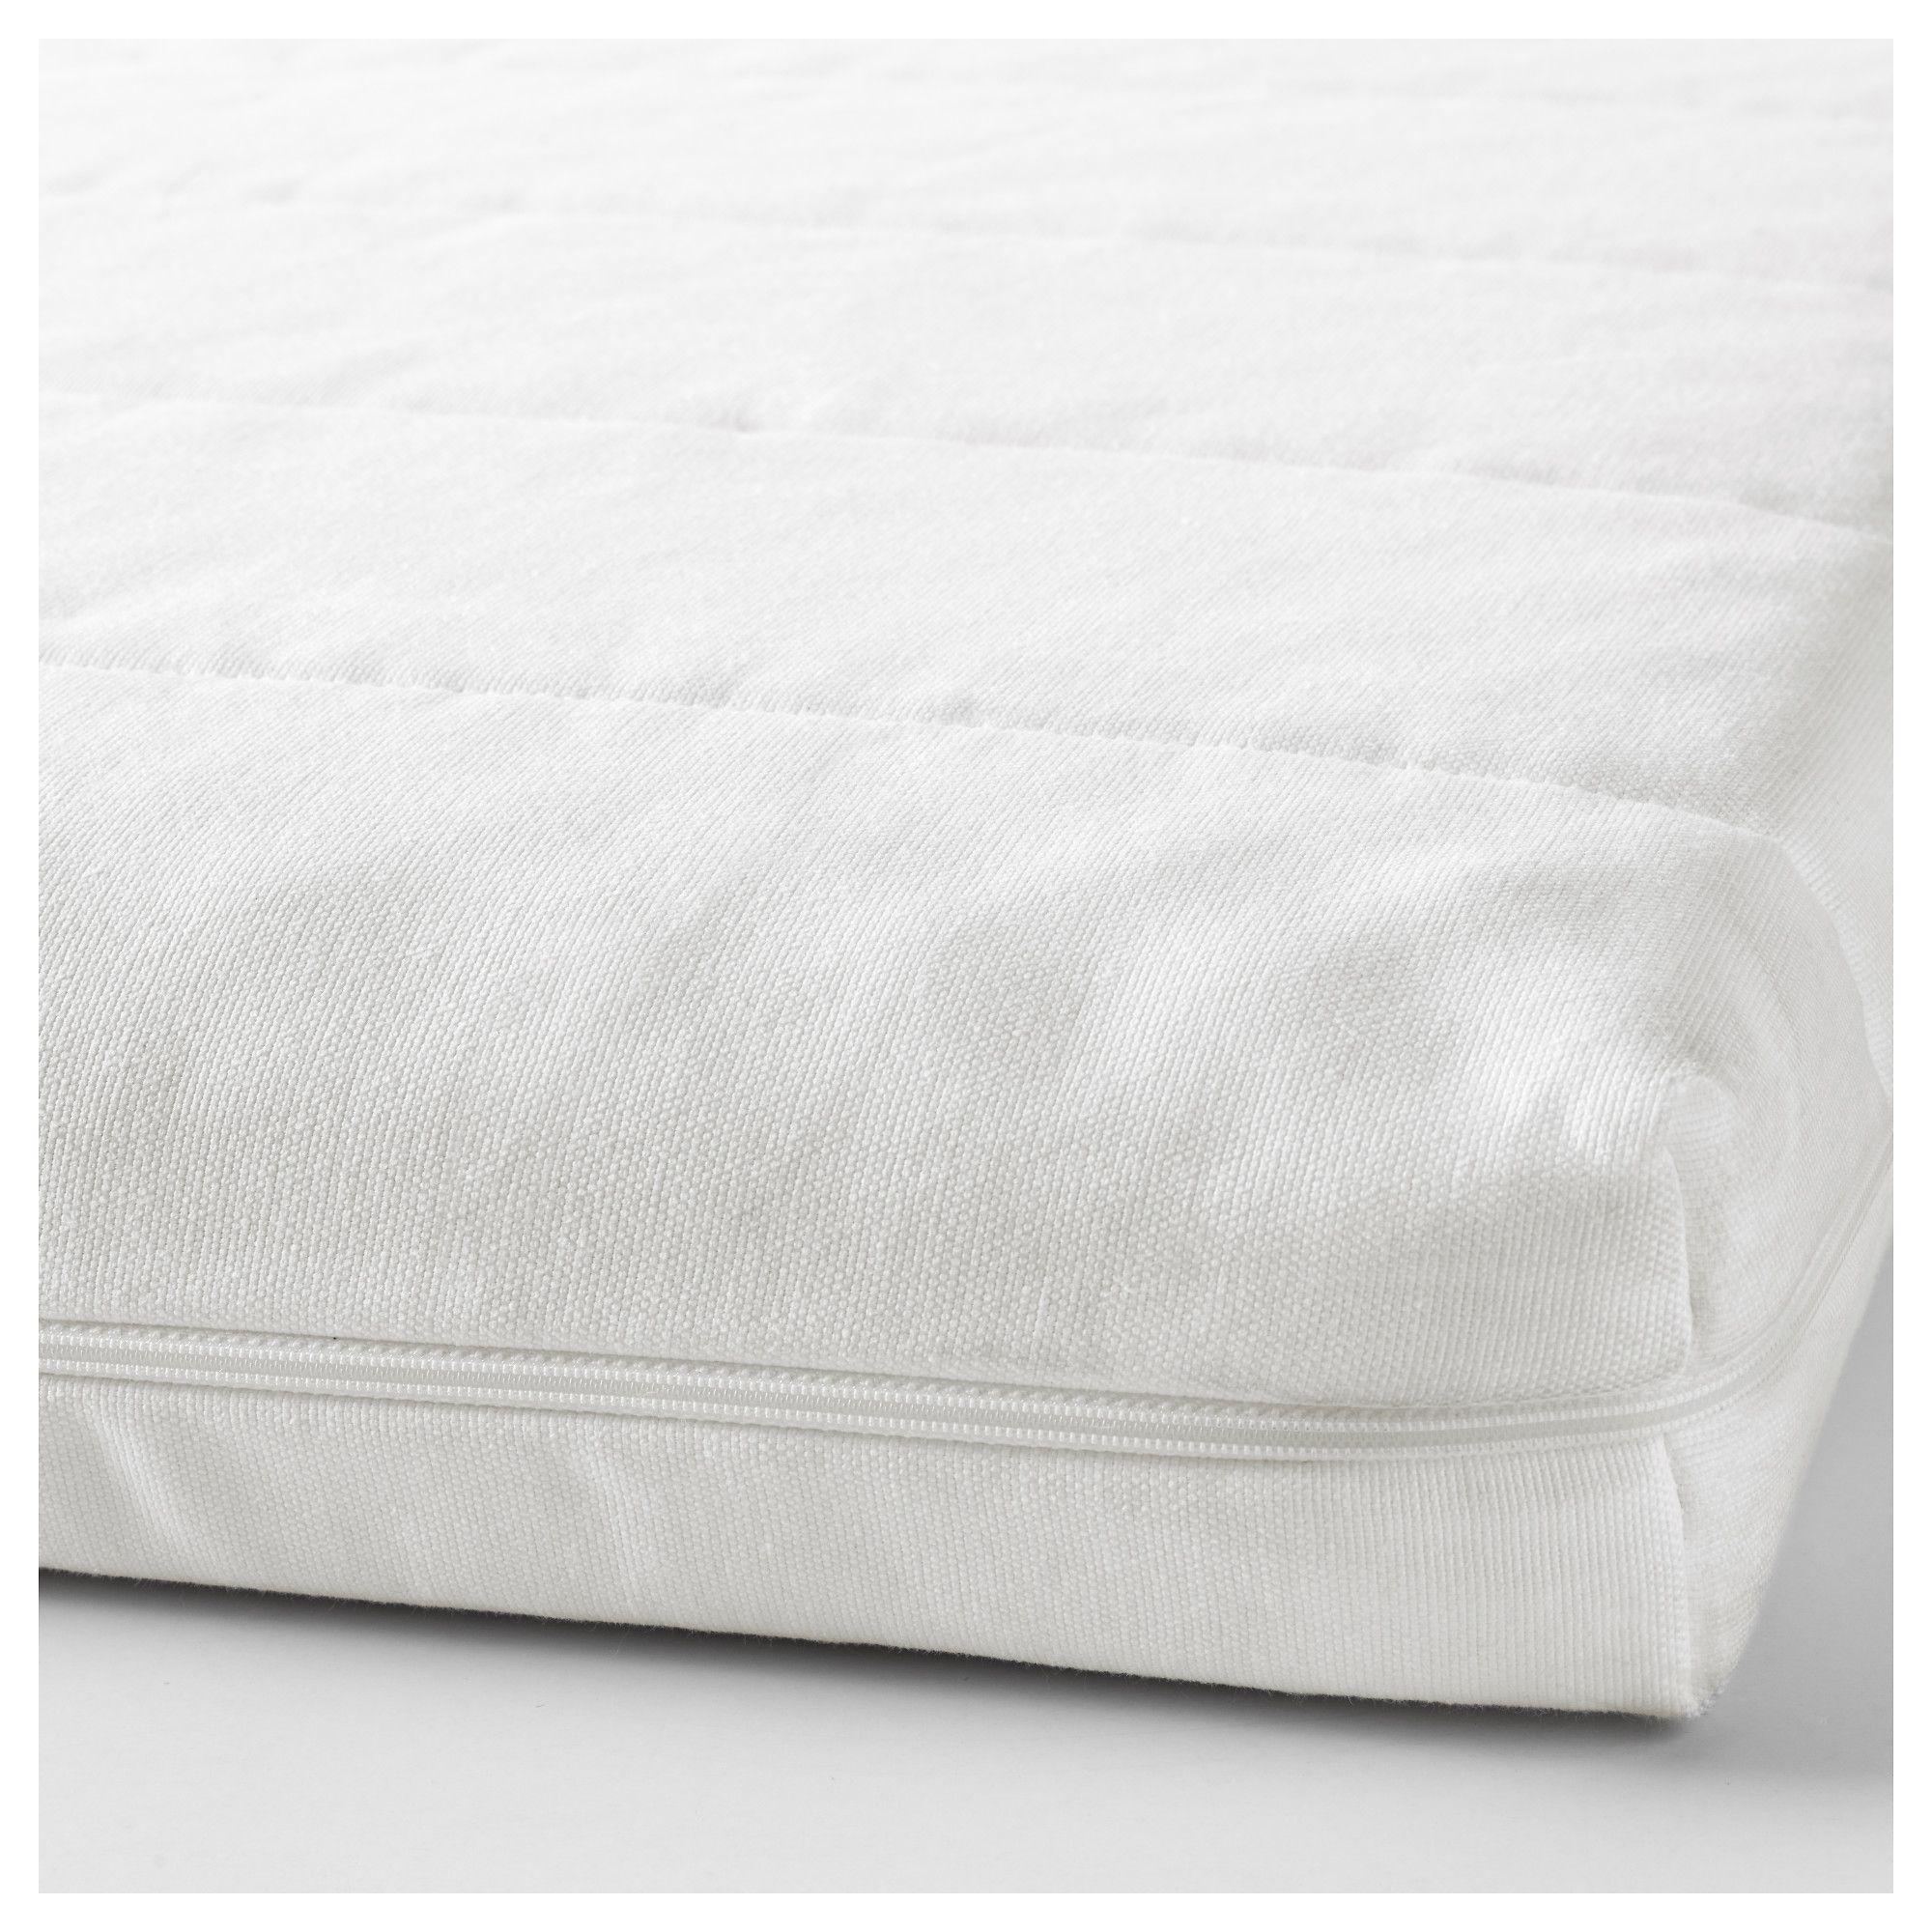 Flekke White Moshult Firm Day Bed W 2 Drawers 2 Mattresses 80x200 Cm Ikea Foam Mattress Ikea Mattress Firm Mattress